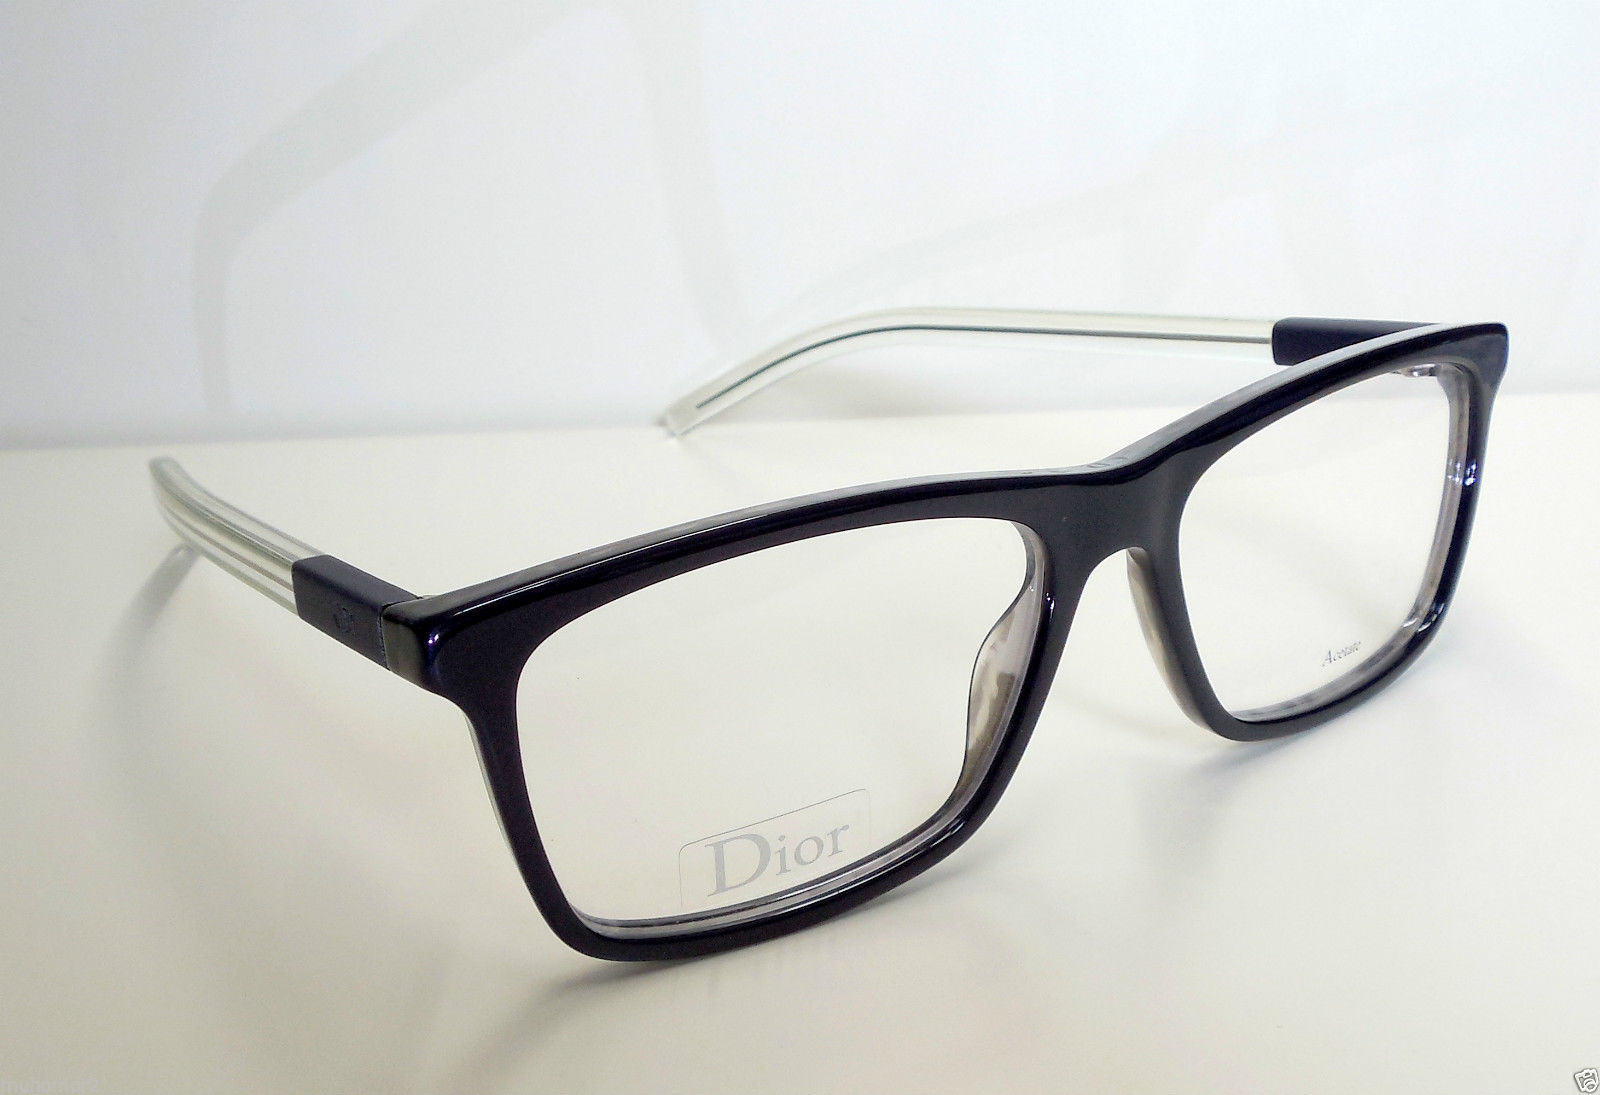 Neu Dior Homme Black Tie 215 Lmx 145 Optyl and 14 similar items